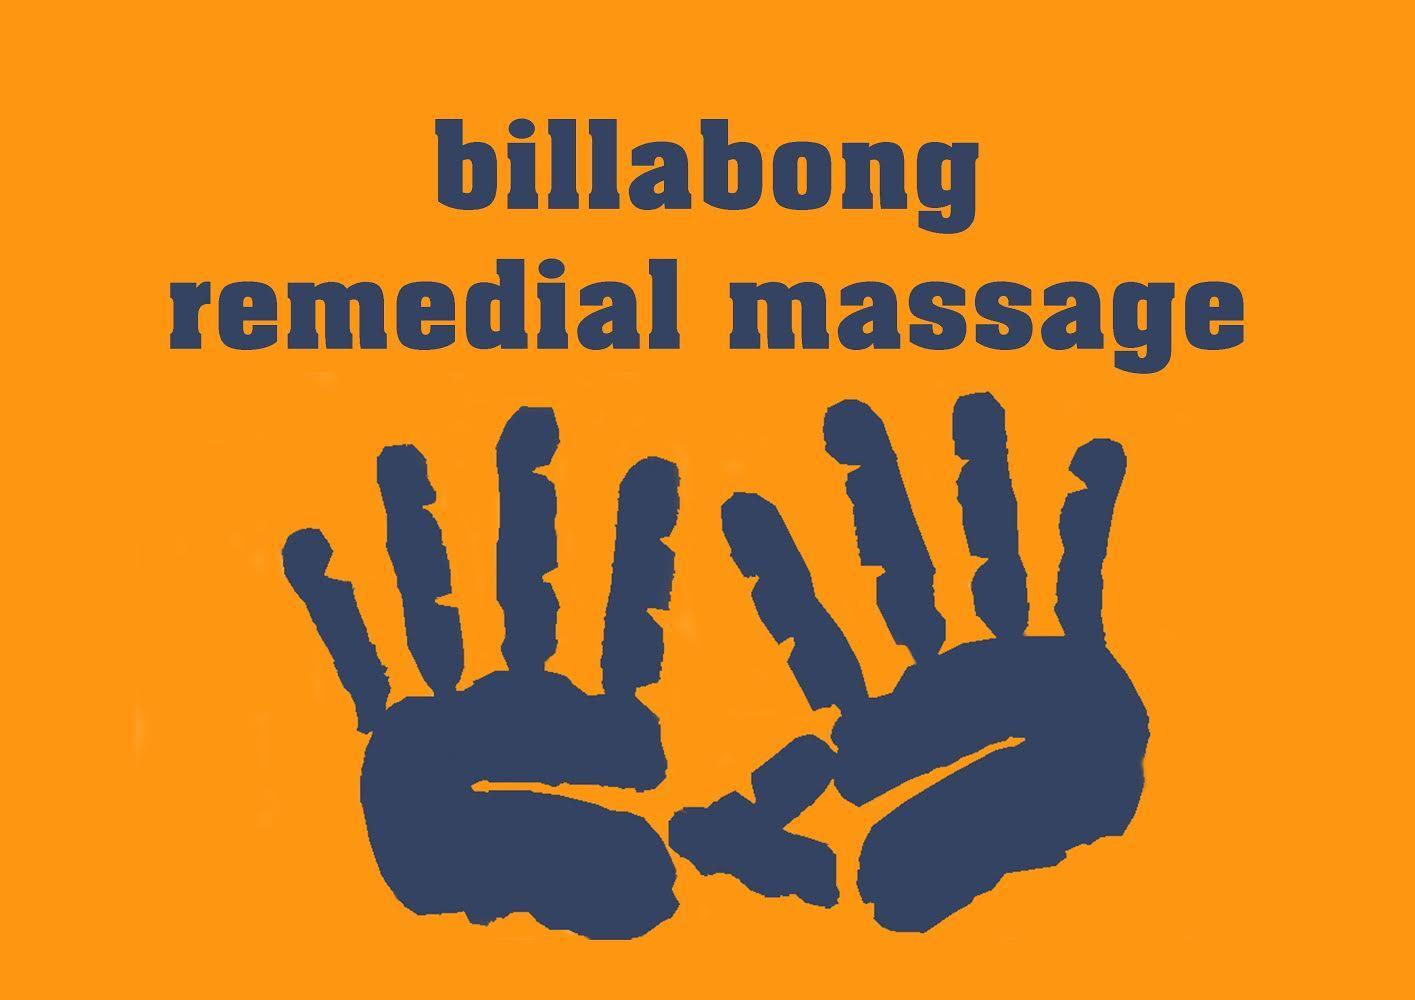 Billabong Remedial Massage Therapy